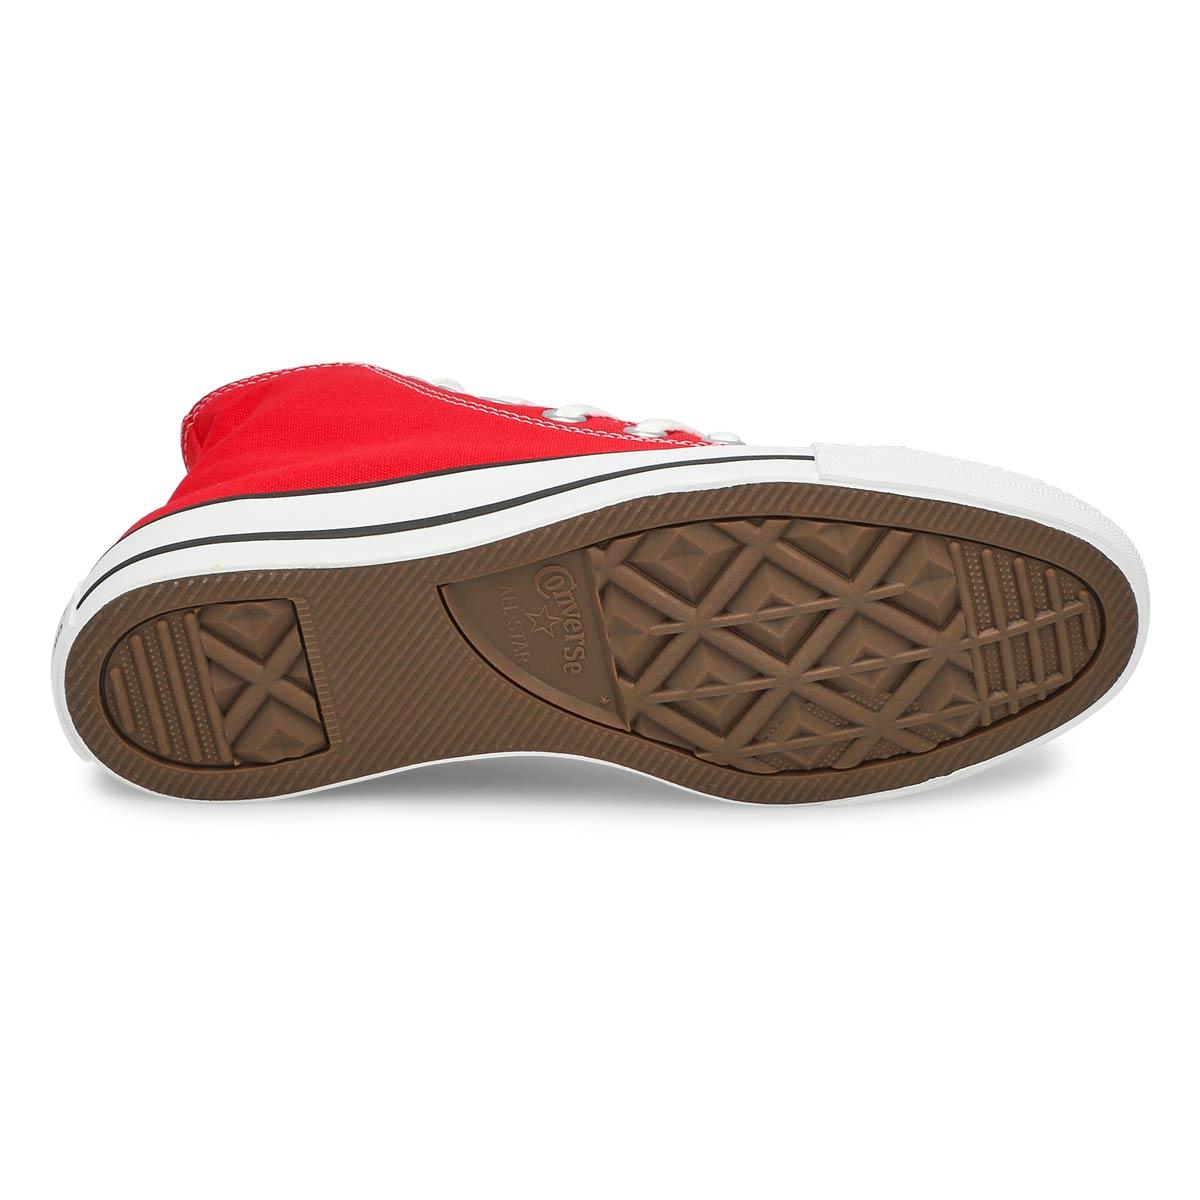 Women's CHUCK TAYLOR CORE HI red sneakers